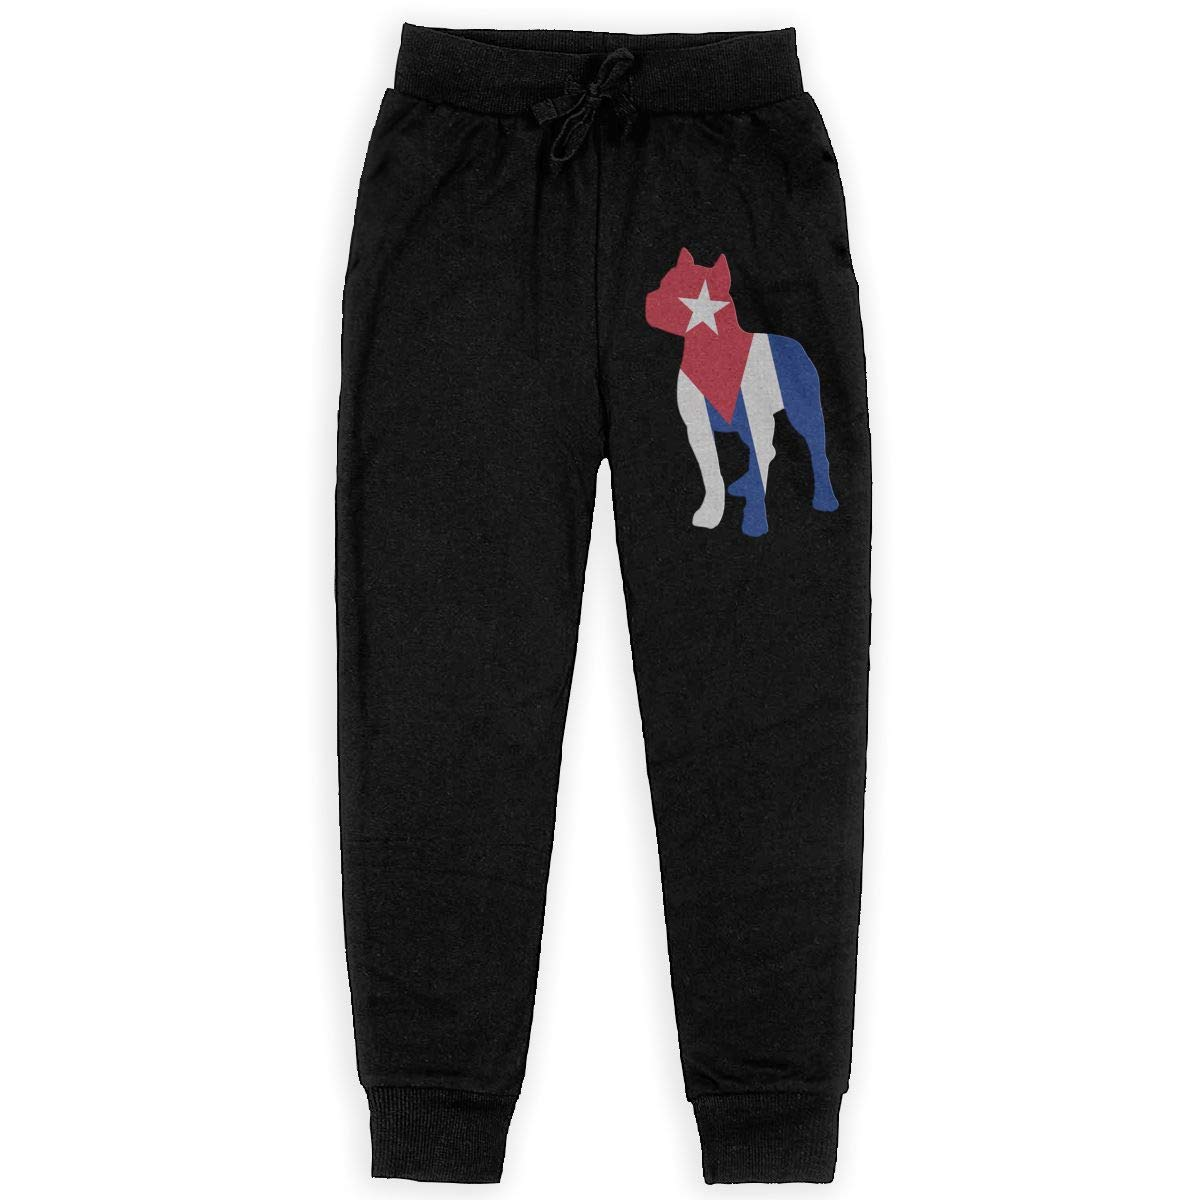 Teenager Jogger Pants for Teen Boy WYZVK22 Patriotic Pitbull Cuba Flag Soft//Cozy Sweatpants